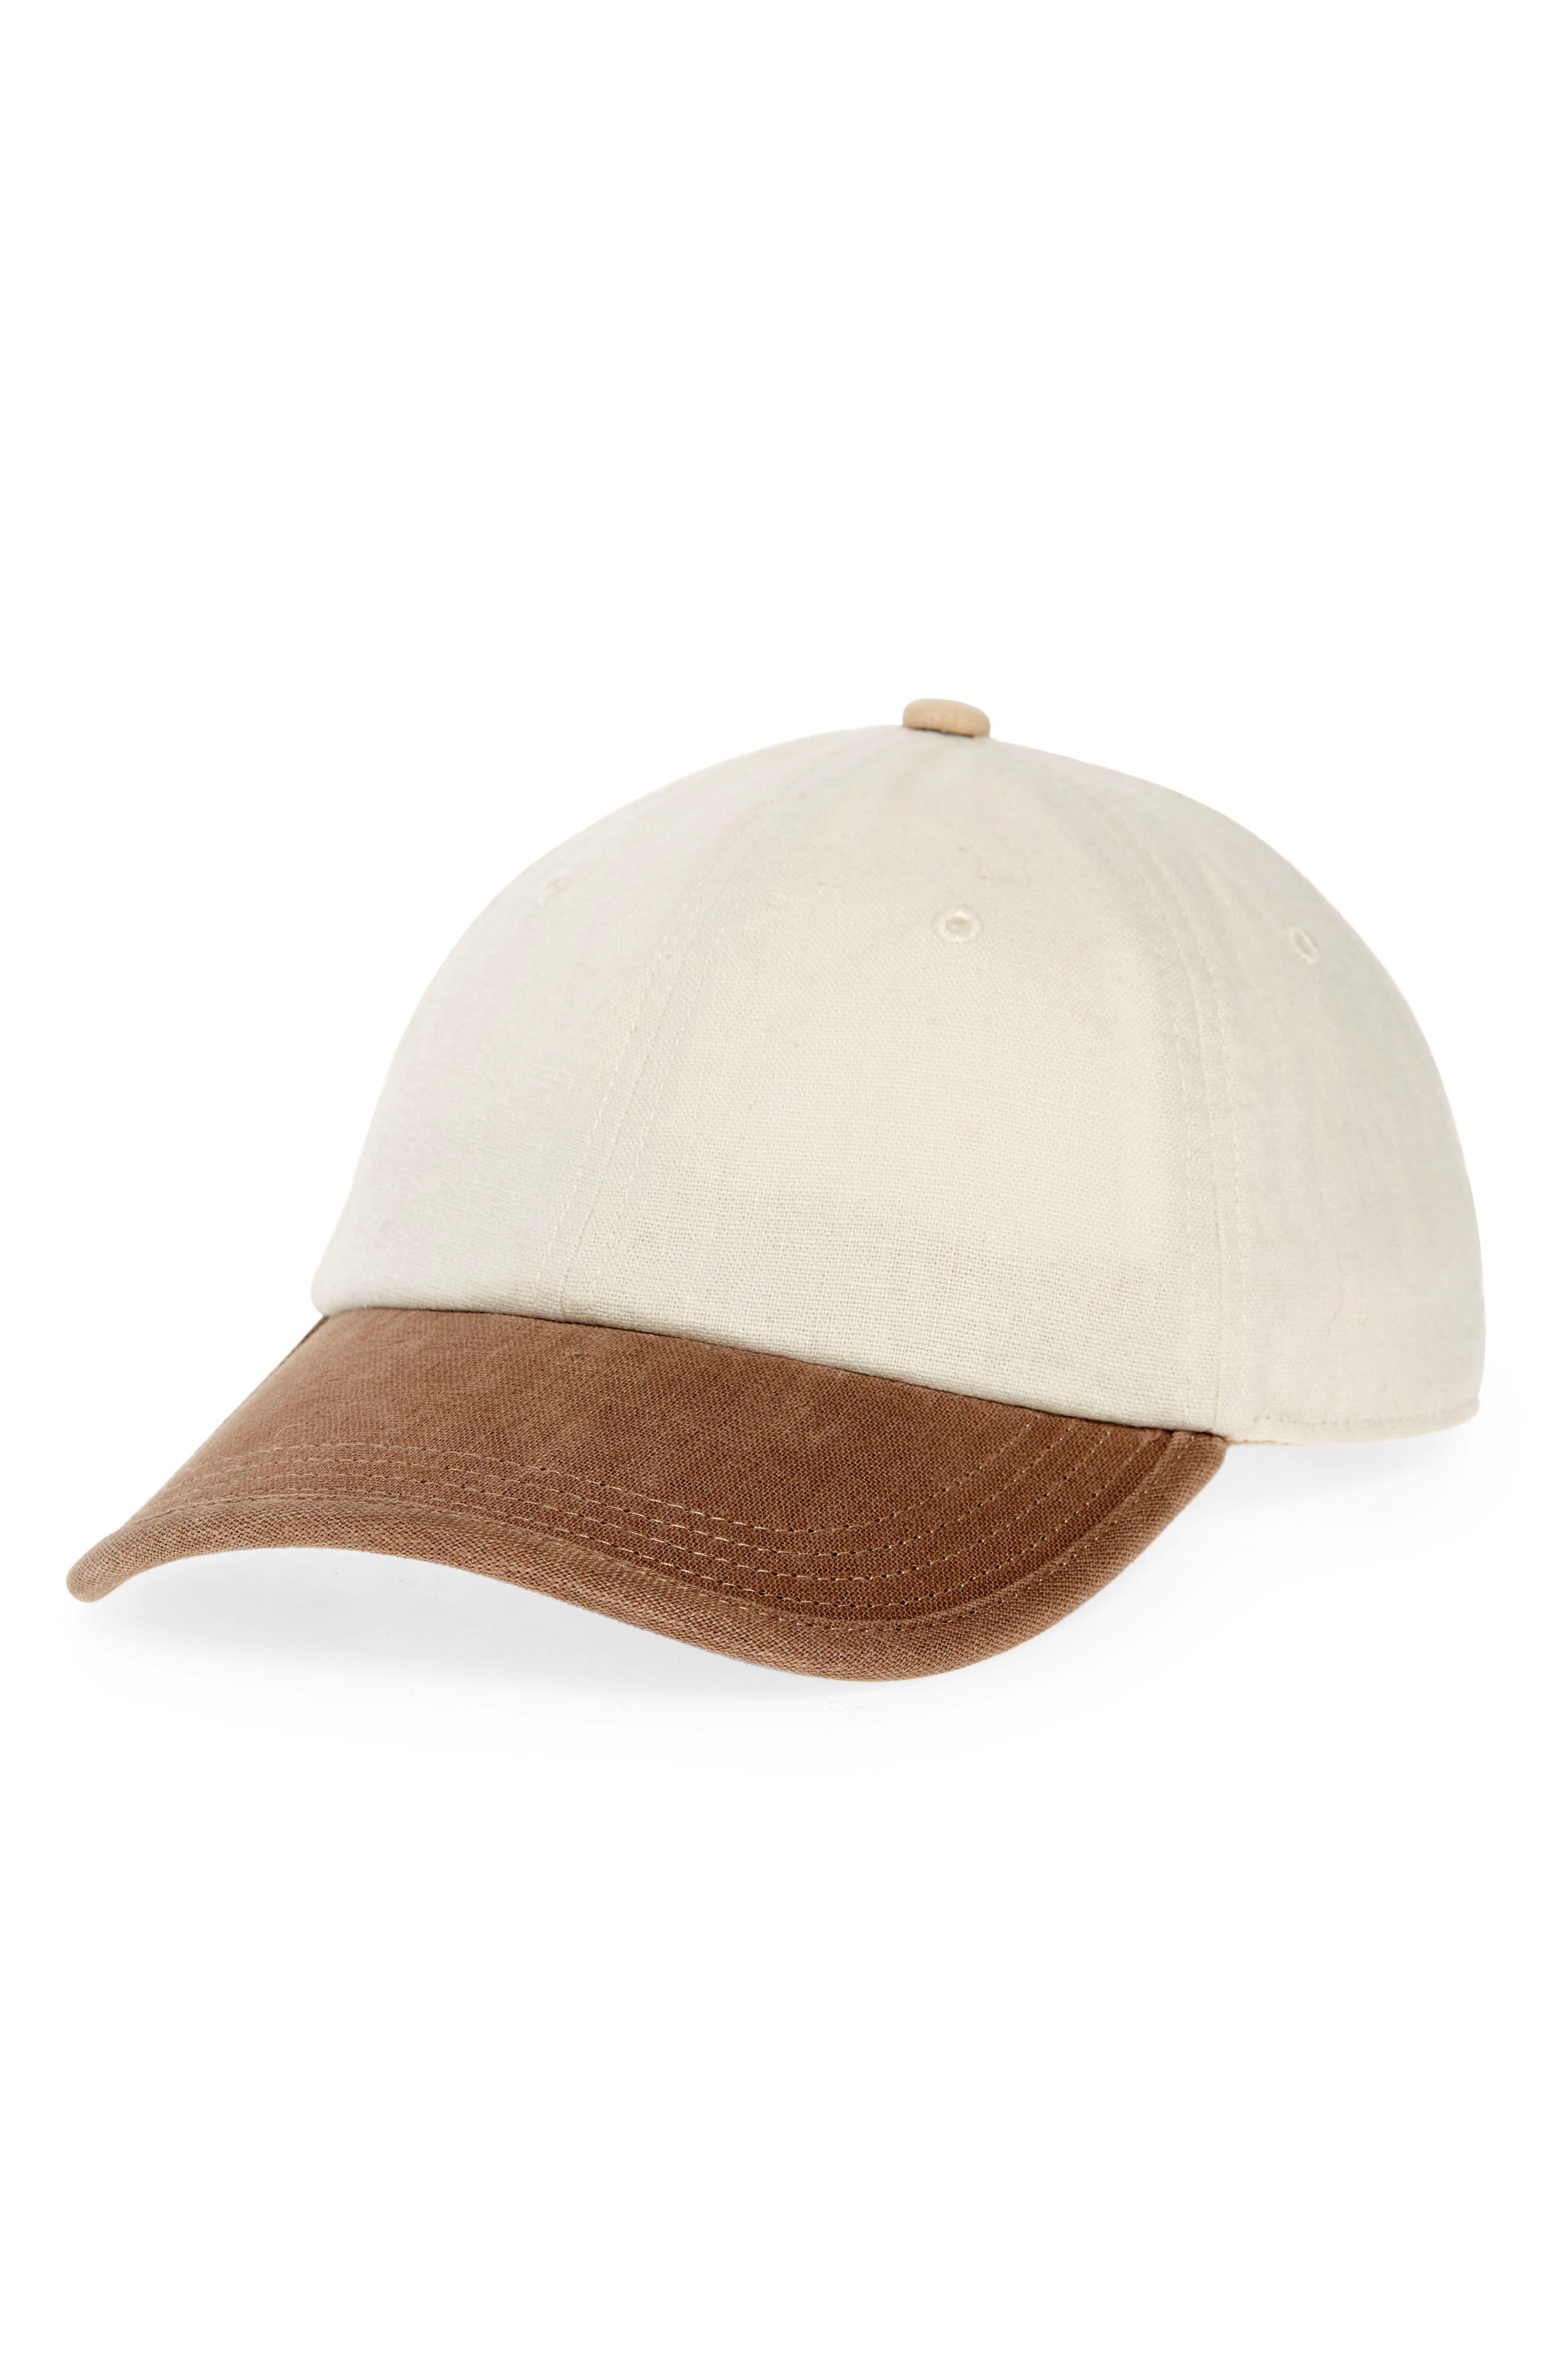 . Easy Does It Baseball Cap